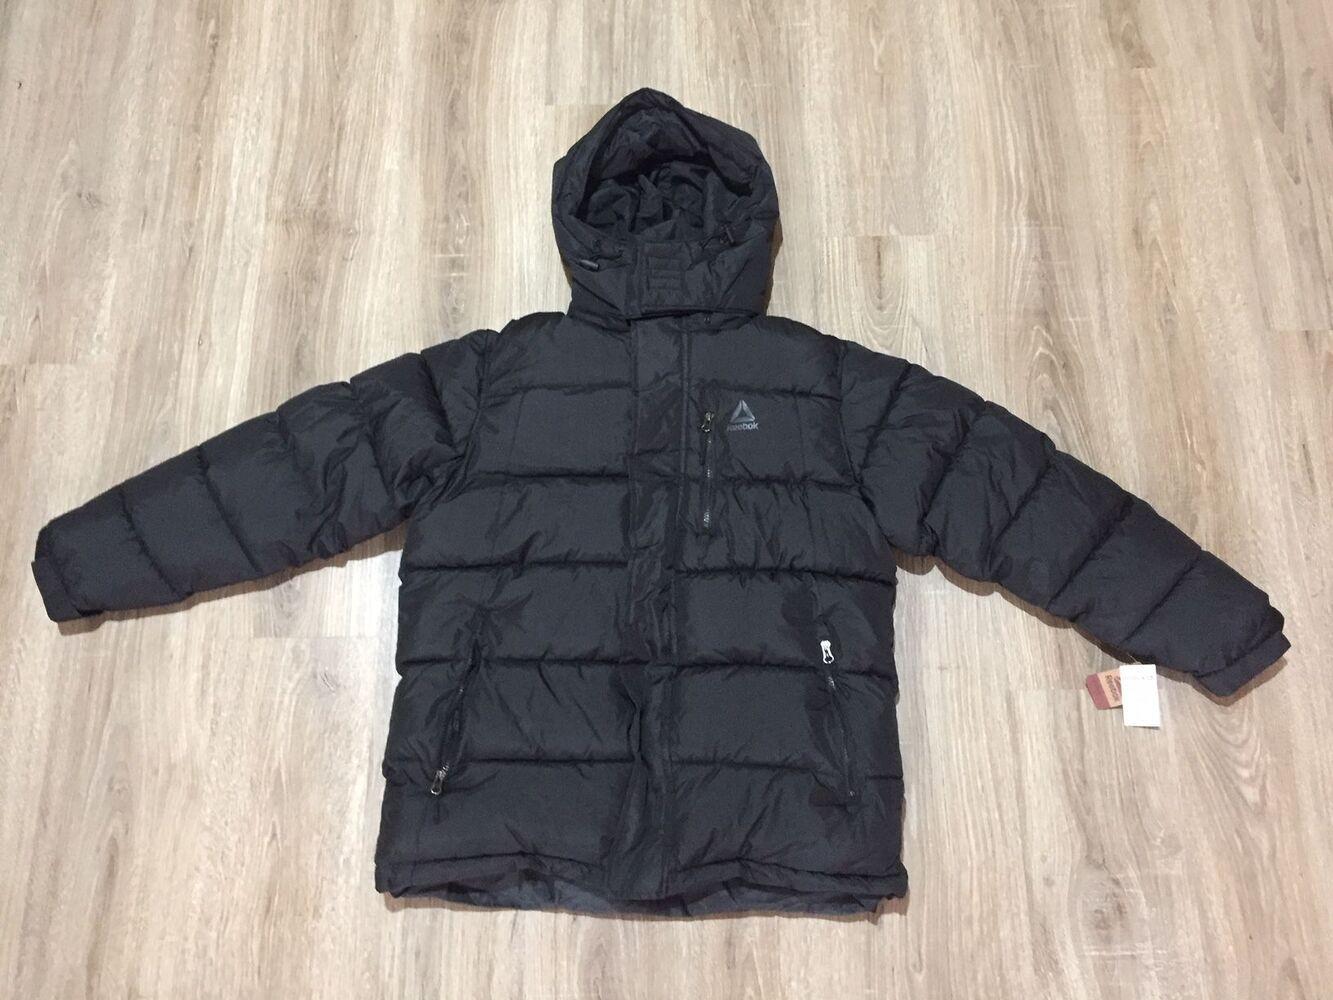 Продам нову зимову куртку Reebok Bubble Jacket